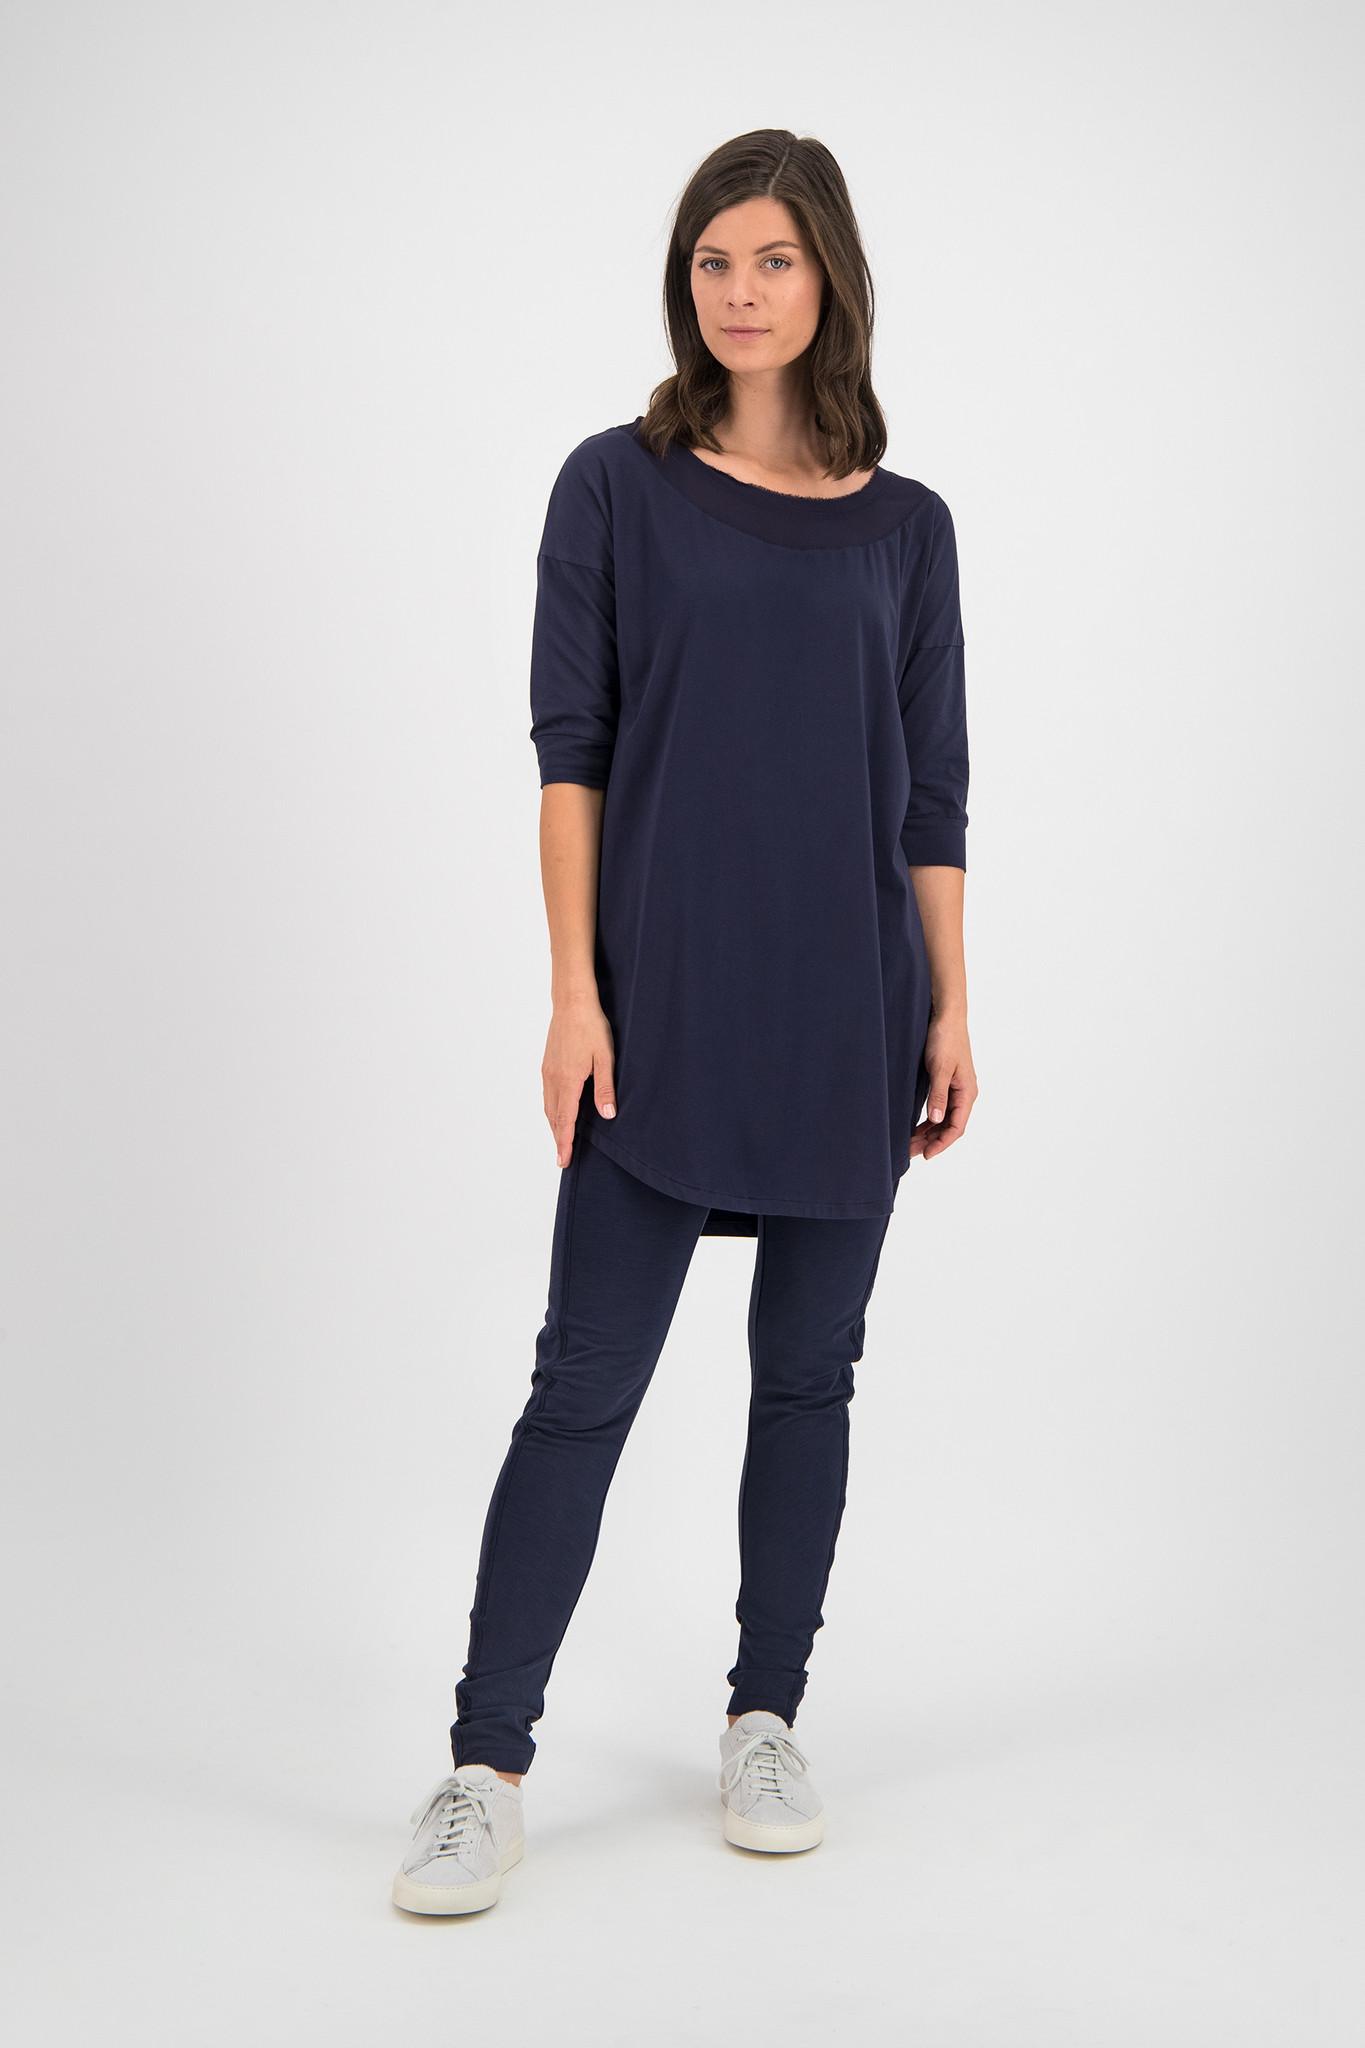 SYLVER Cotton Elastane Shirt 3/4 Sleeve - Dark Blue